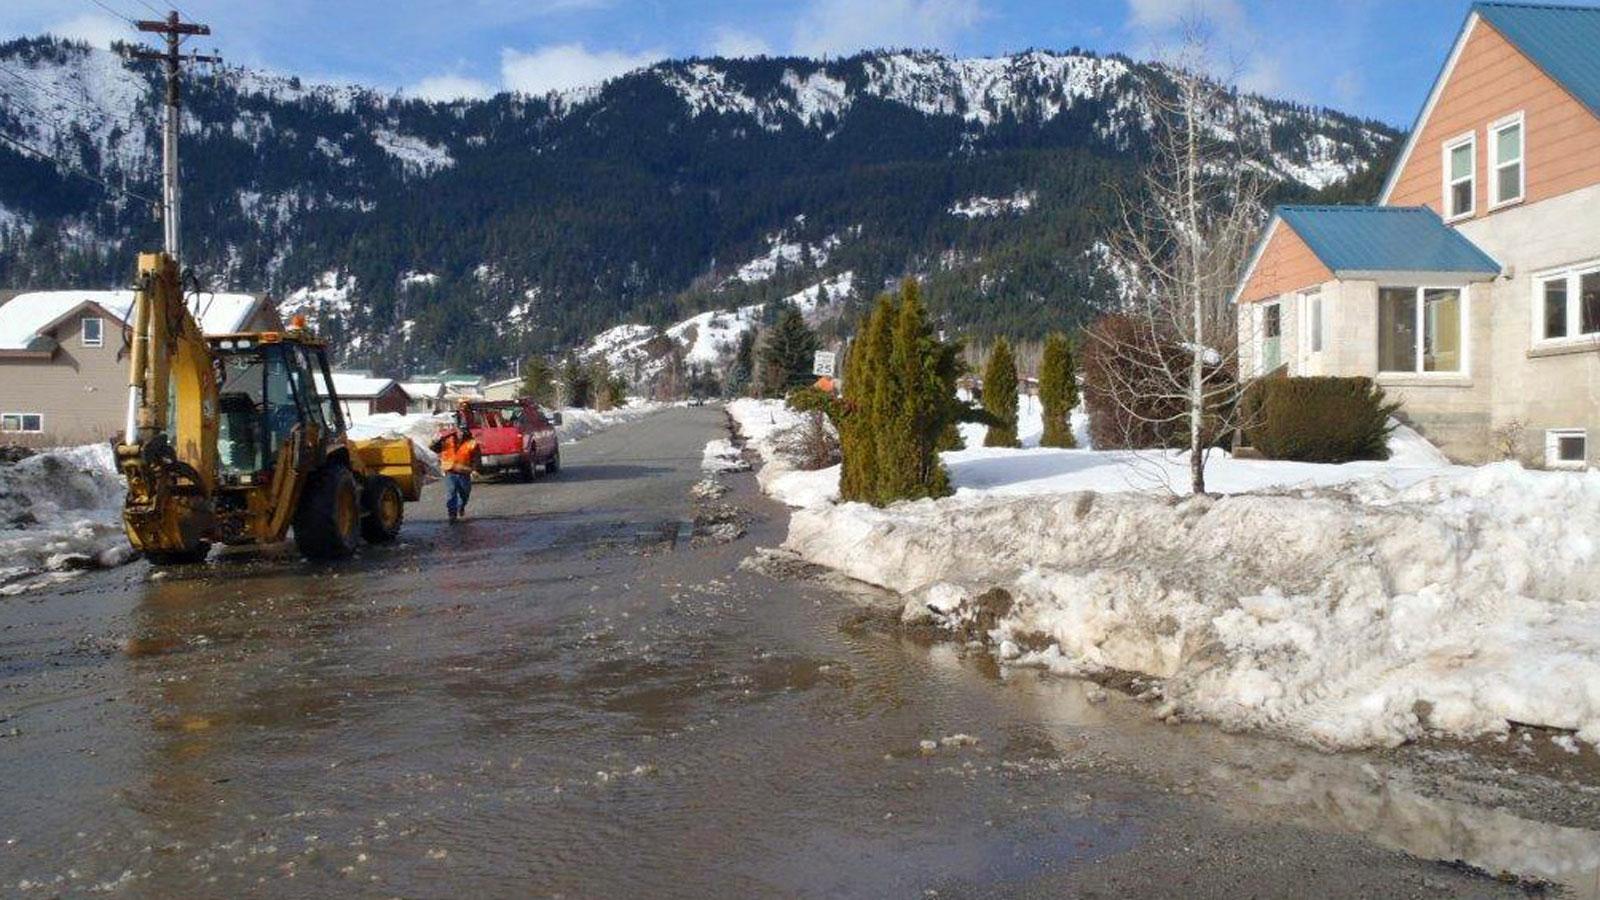 Public input points to preferred improvements in Ski Hill Basin